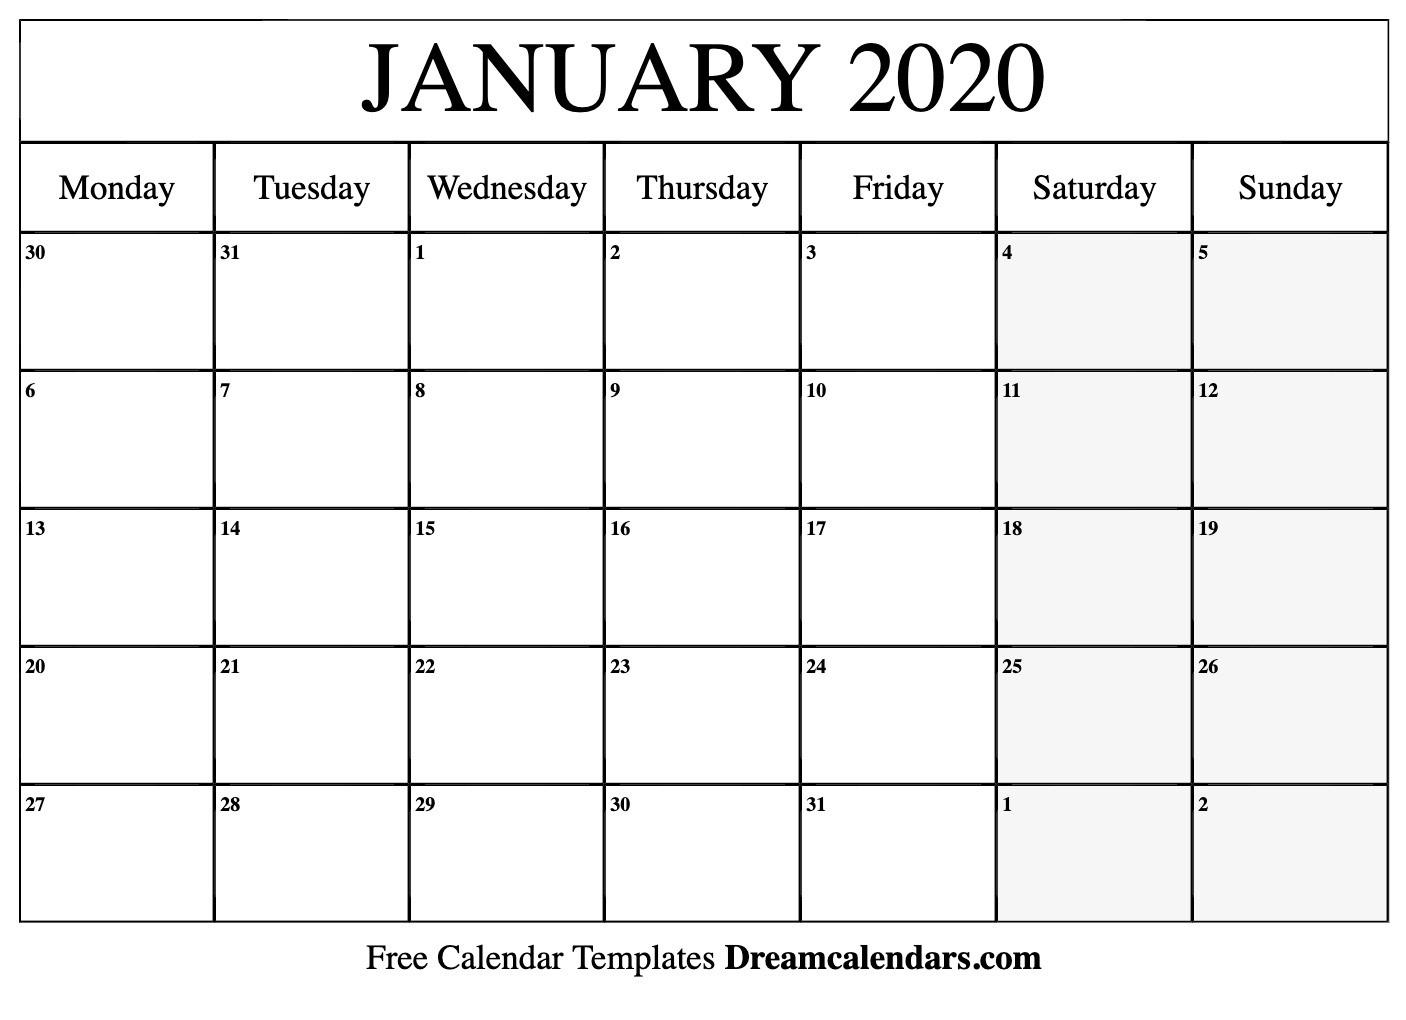 Printable January 2020 Calendar-Blank Calendar Template January 2020